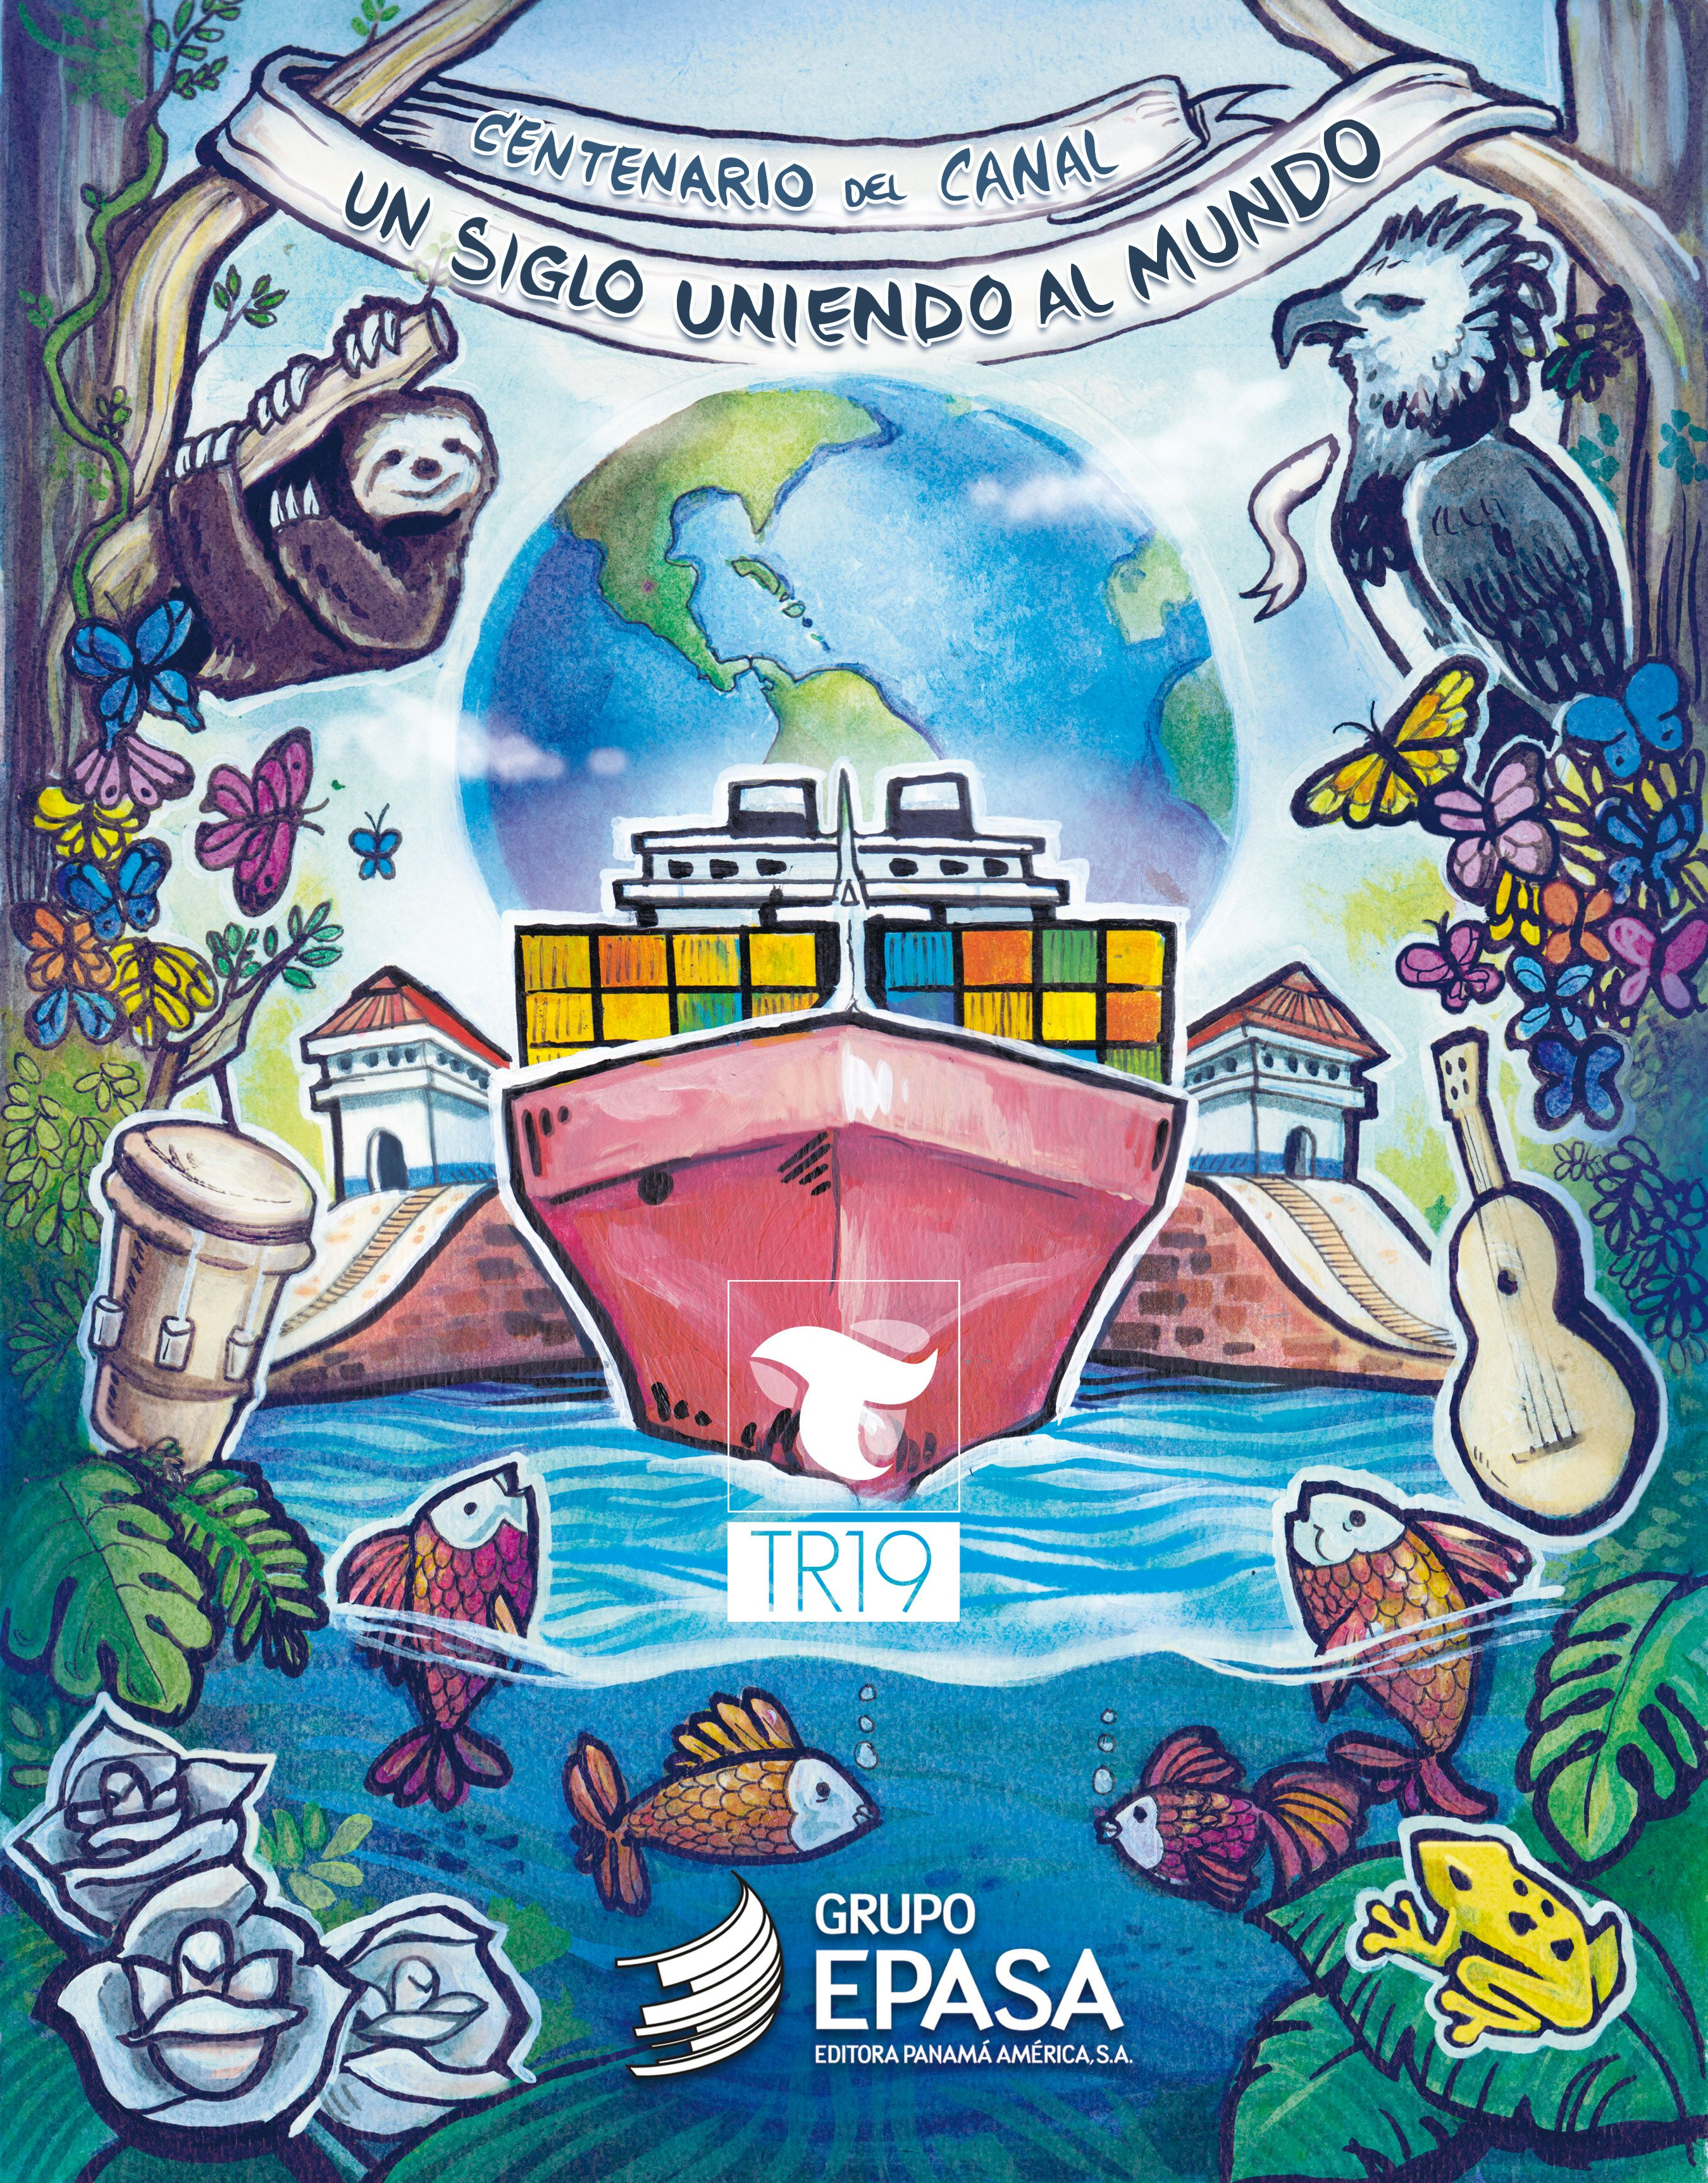 Ilustracion Ganadora De Mi Autoria Realizado Para La Portada De Suplemento Especial De Epasa Panama America Critica Dia Di Panama Canal Art Art Painting